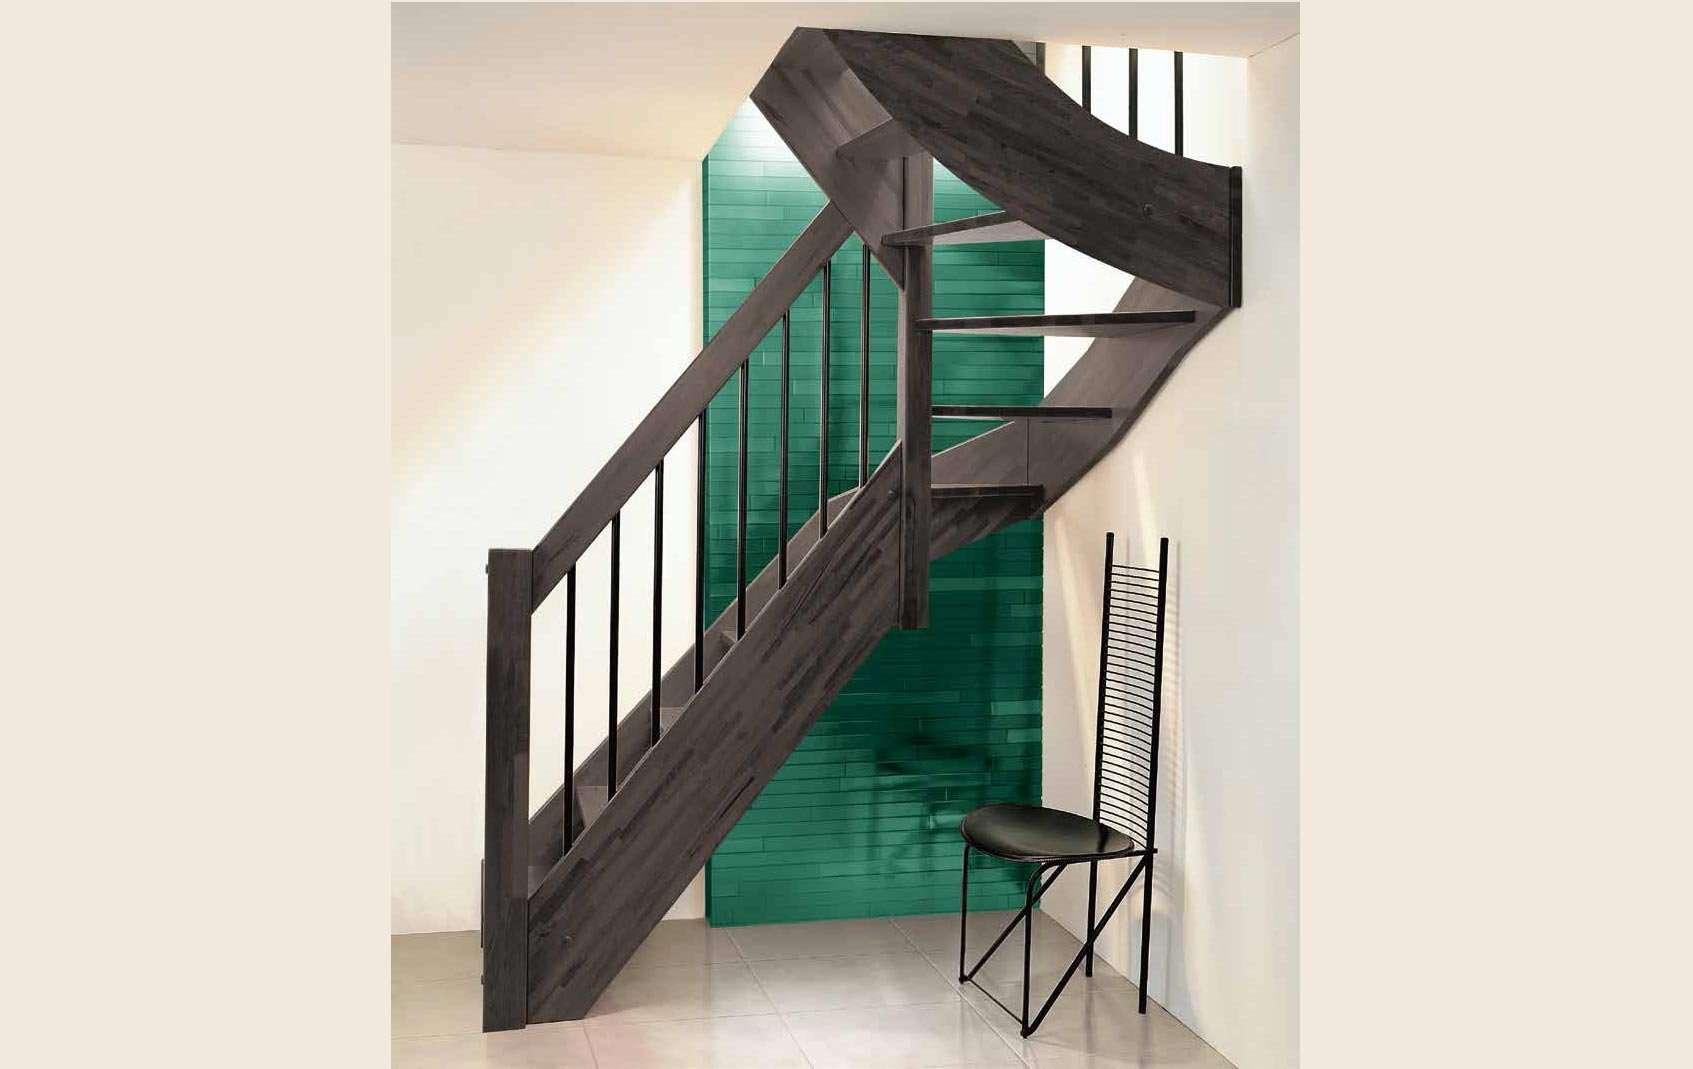 rampe d escalier ext rieur. Black Bedroom Furniture Sets. Home Design Ideas